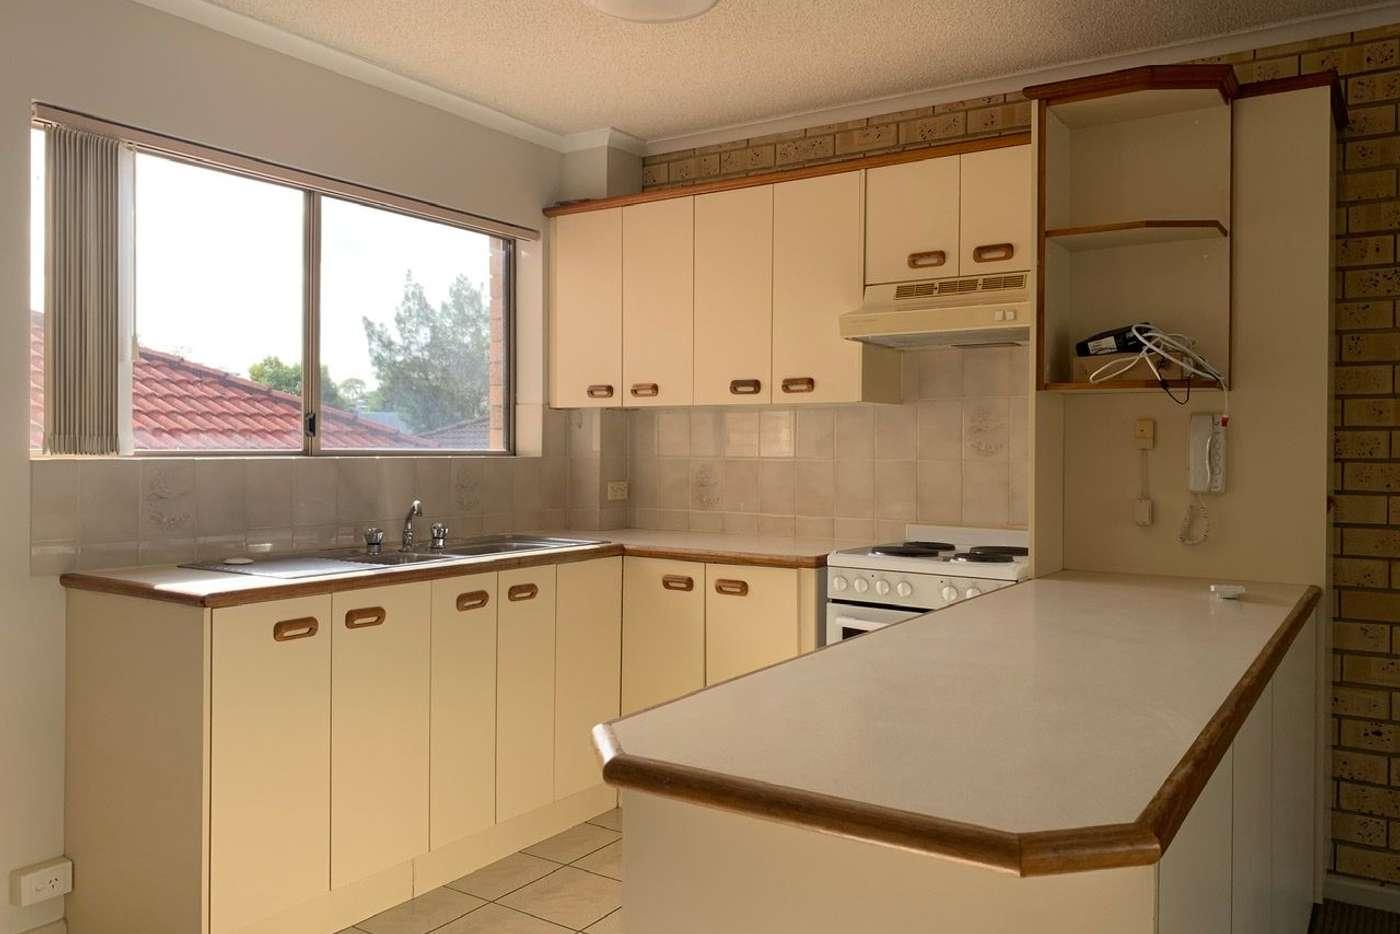 Main view of Homely unit listing, 5/21 Rise Street, Mount Gravatt East QLD 4122